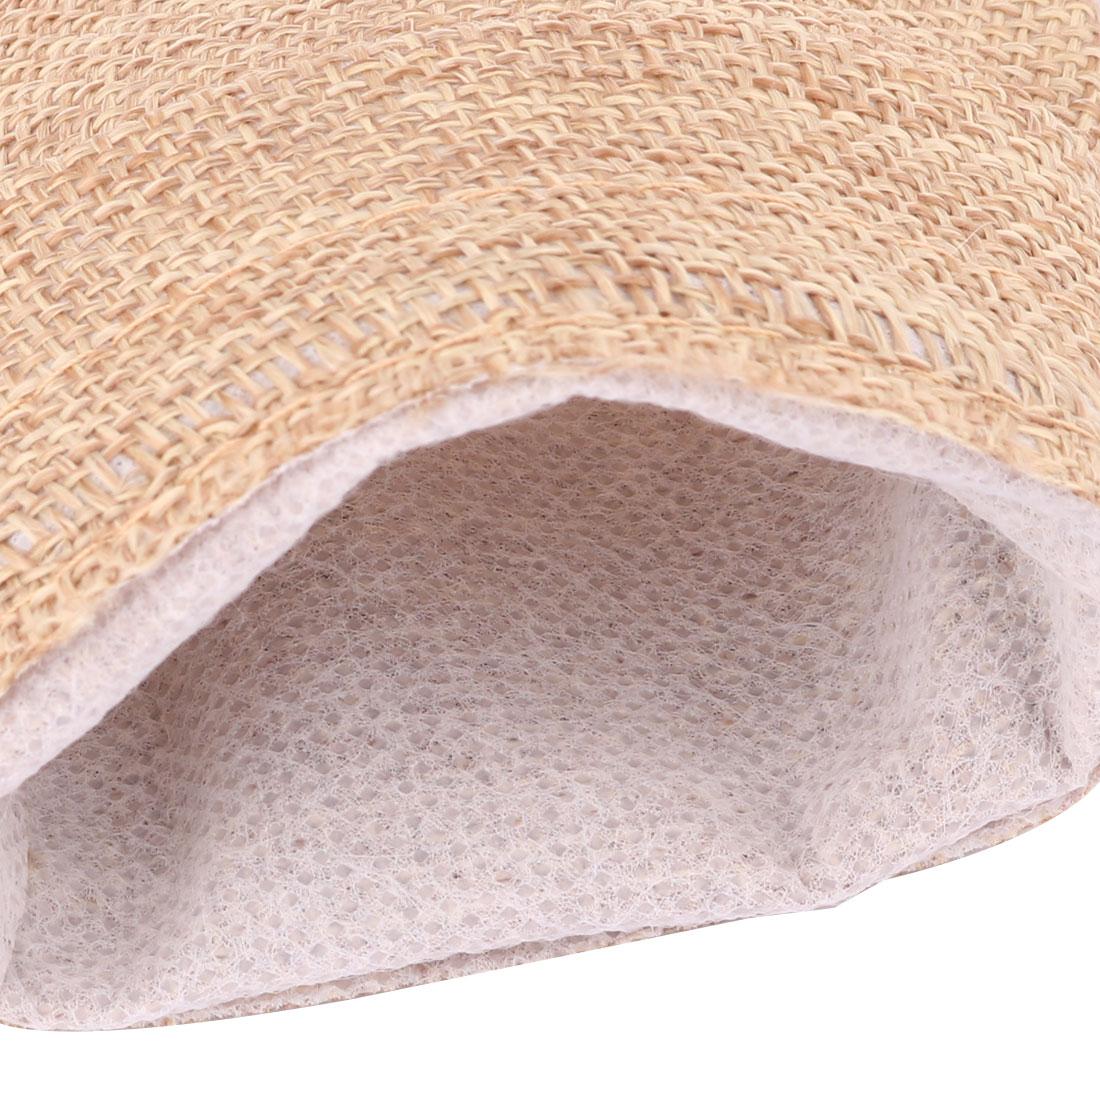 Lady Outdoor Cotton Linen Jewelry Ring Holder Drawstring Bag Pouch Khaki 25pcs - image 2 de 5